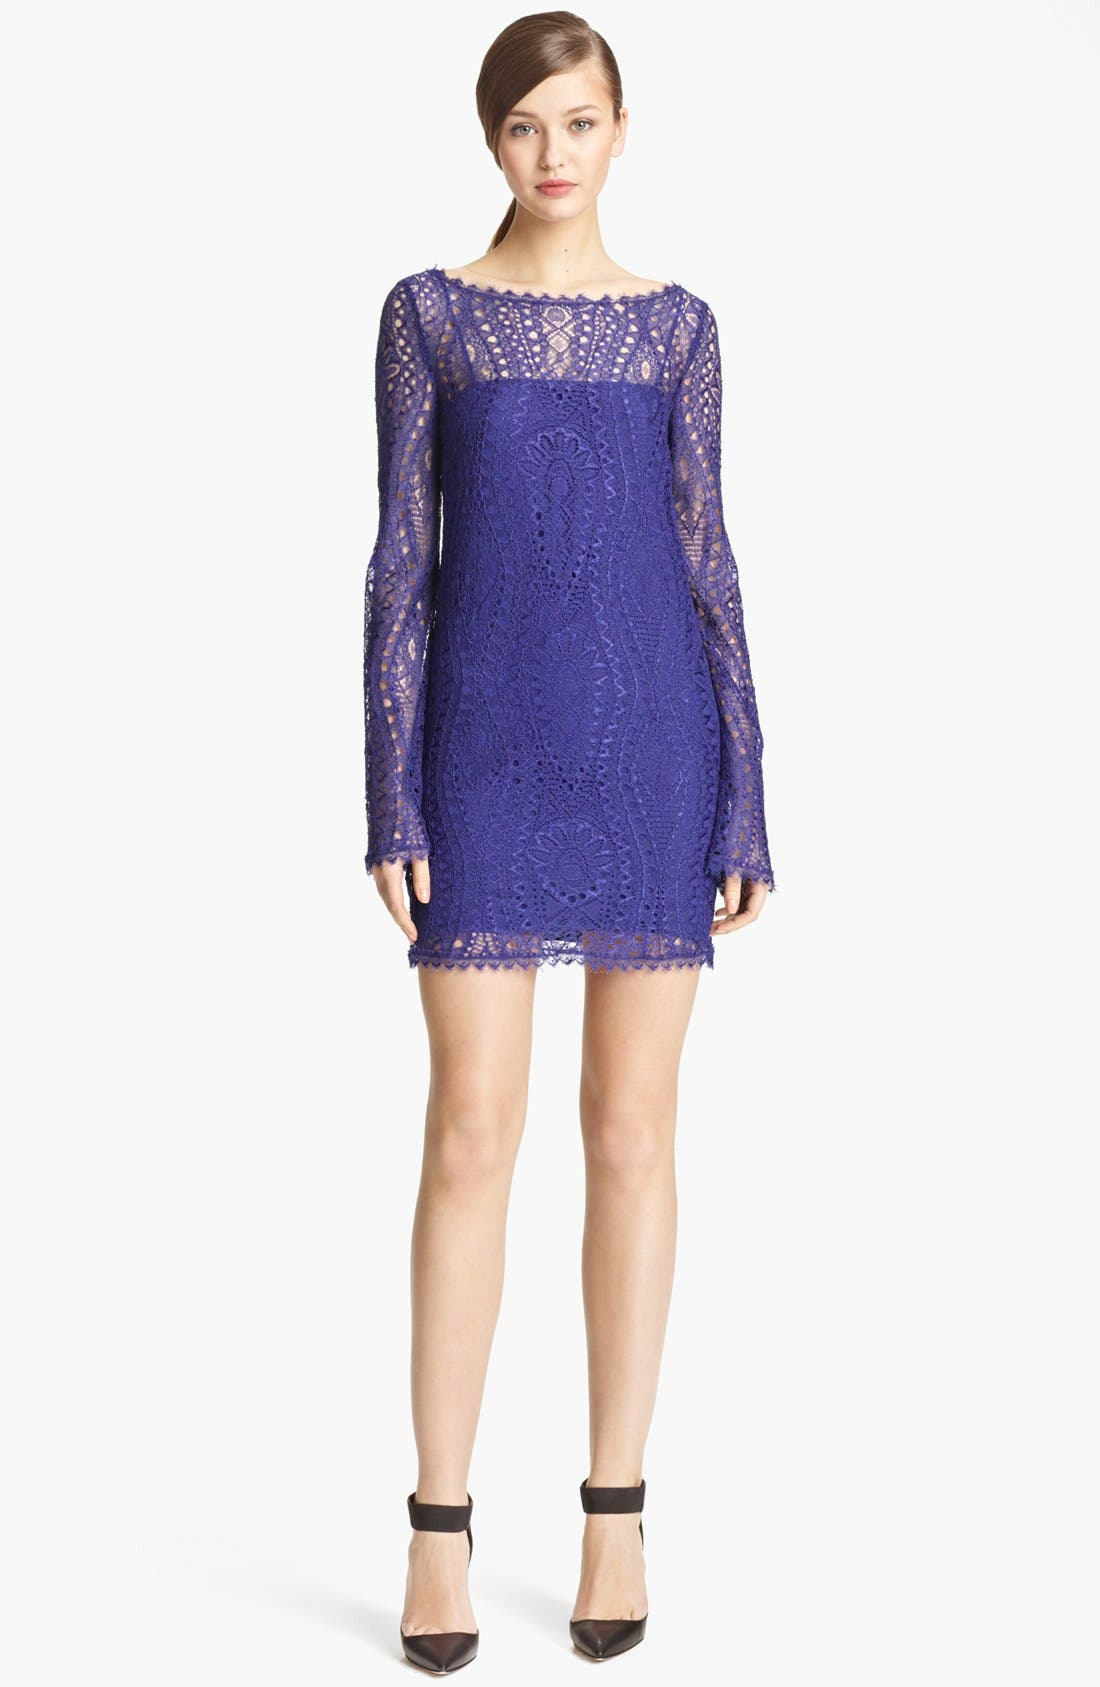 Main Image - Emilio Pucci Guipure Lace Dress